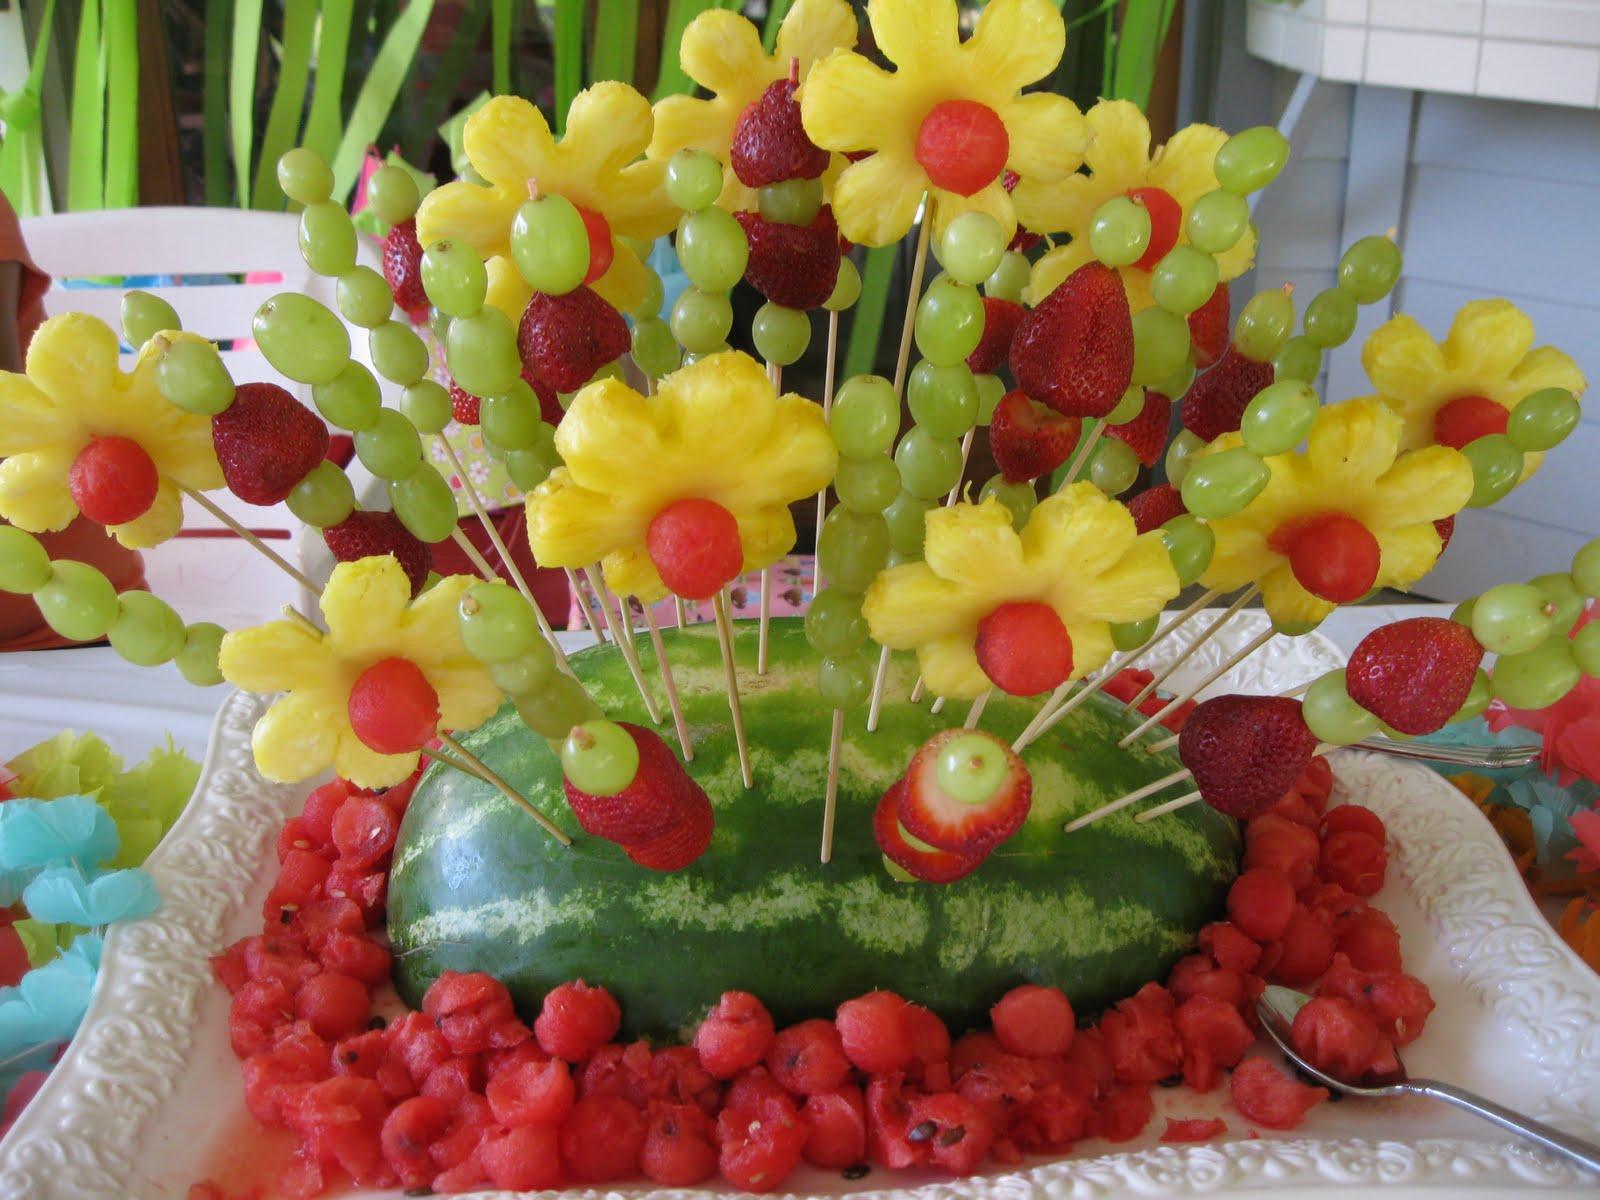 Festa De 15 Anos Ideas: Sweet Shoppe: Girly Luau Birthday Party